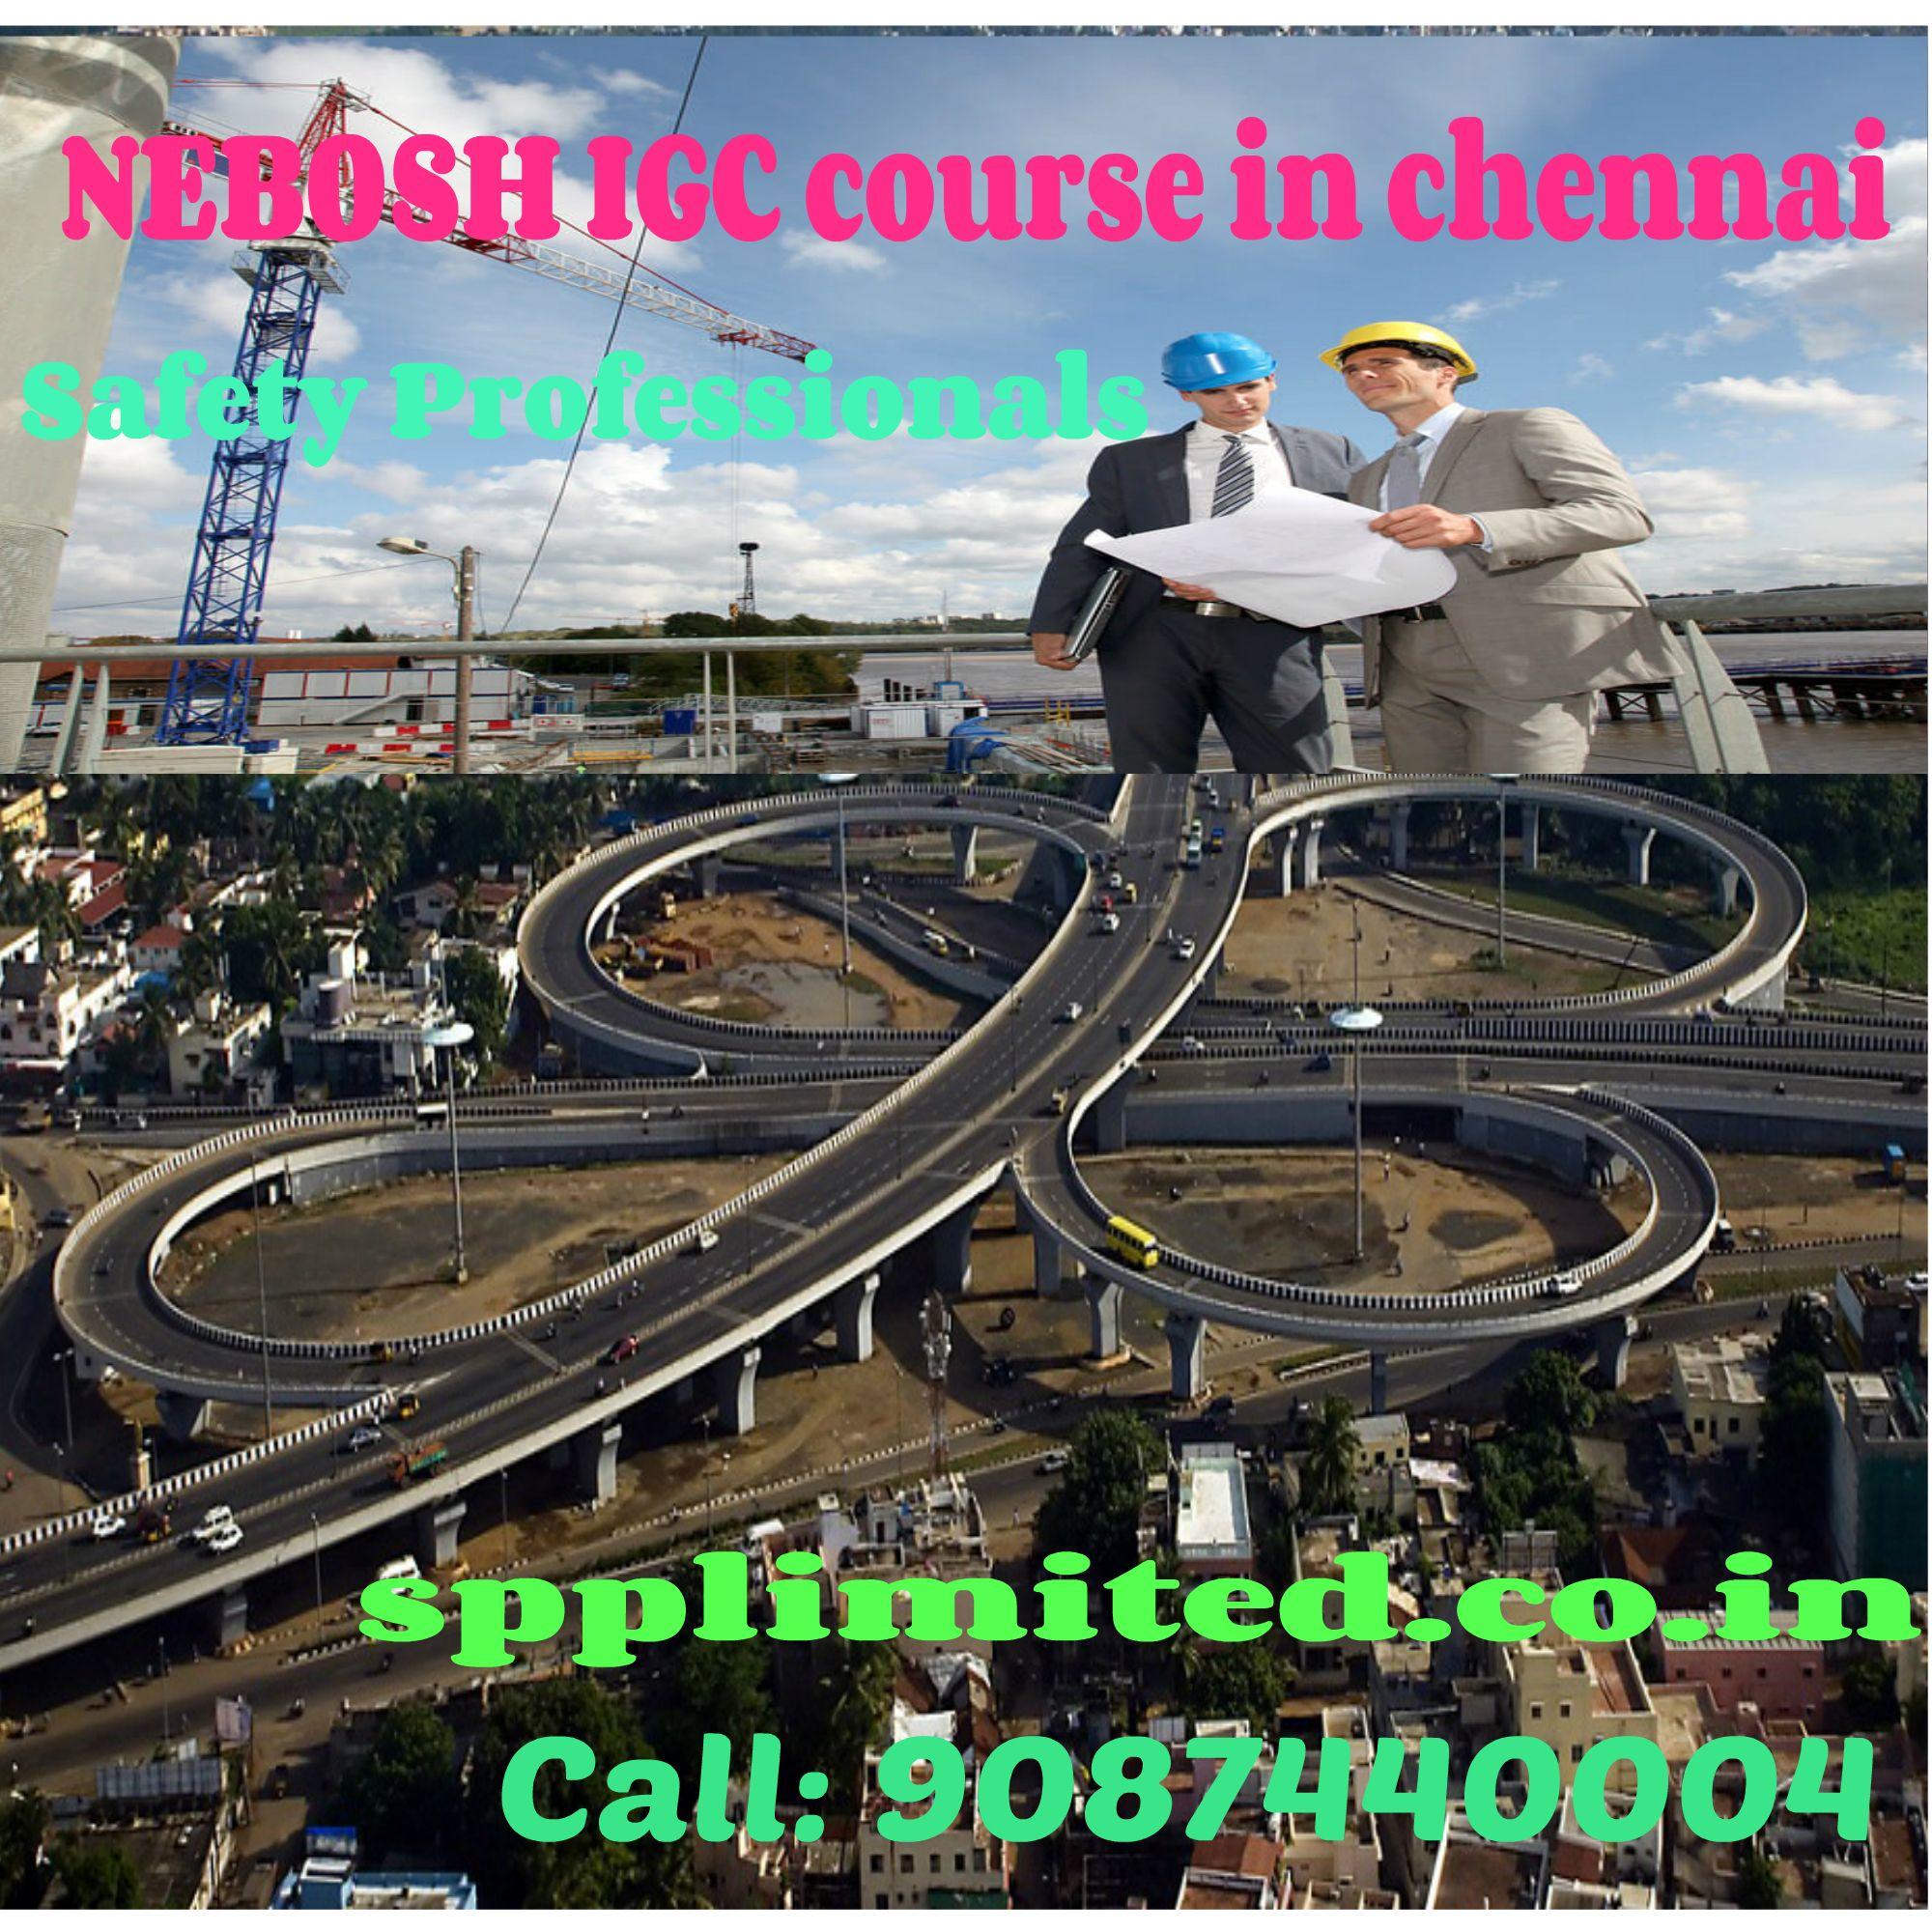 nebosh course in chennai Call 9087440004 / 9566666424